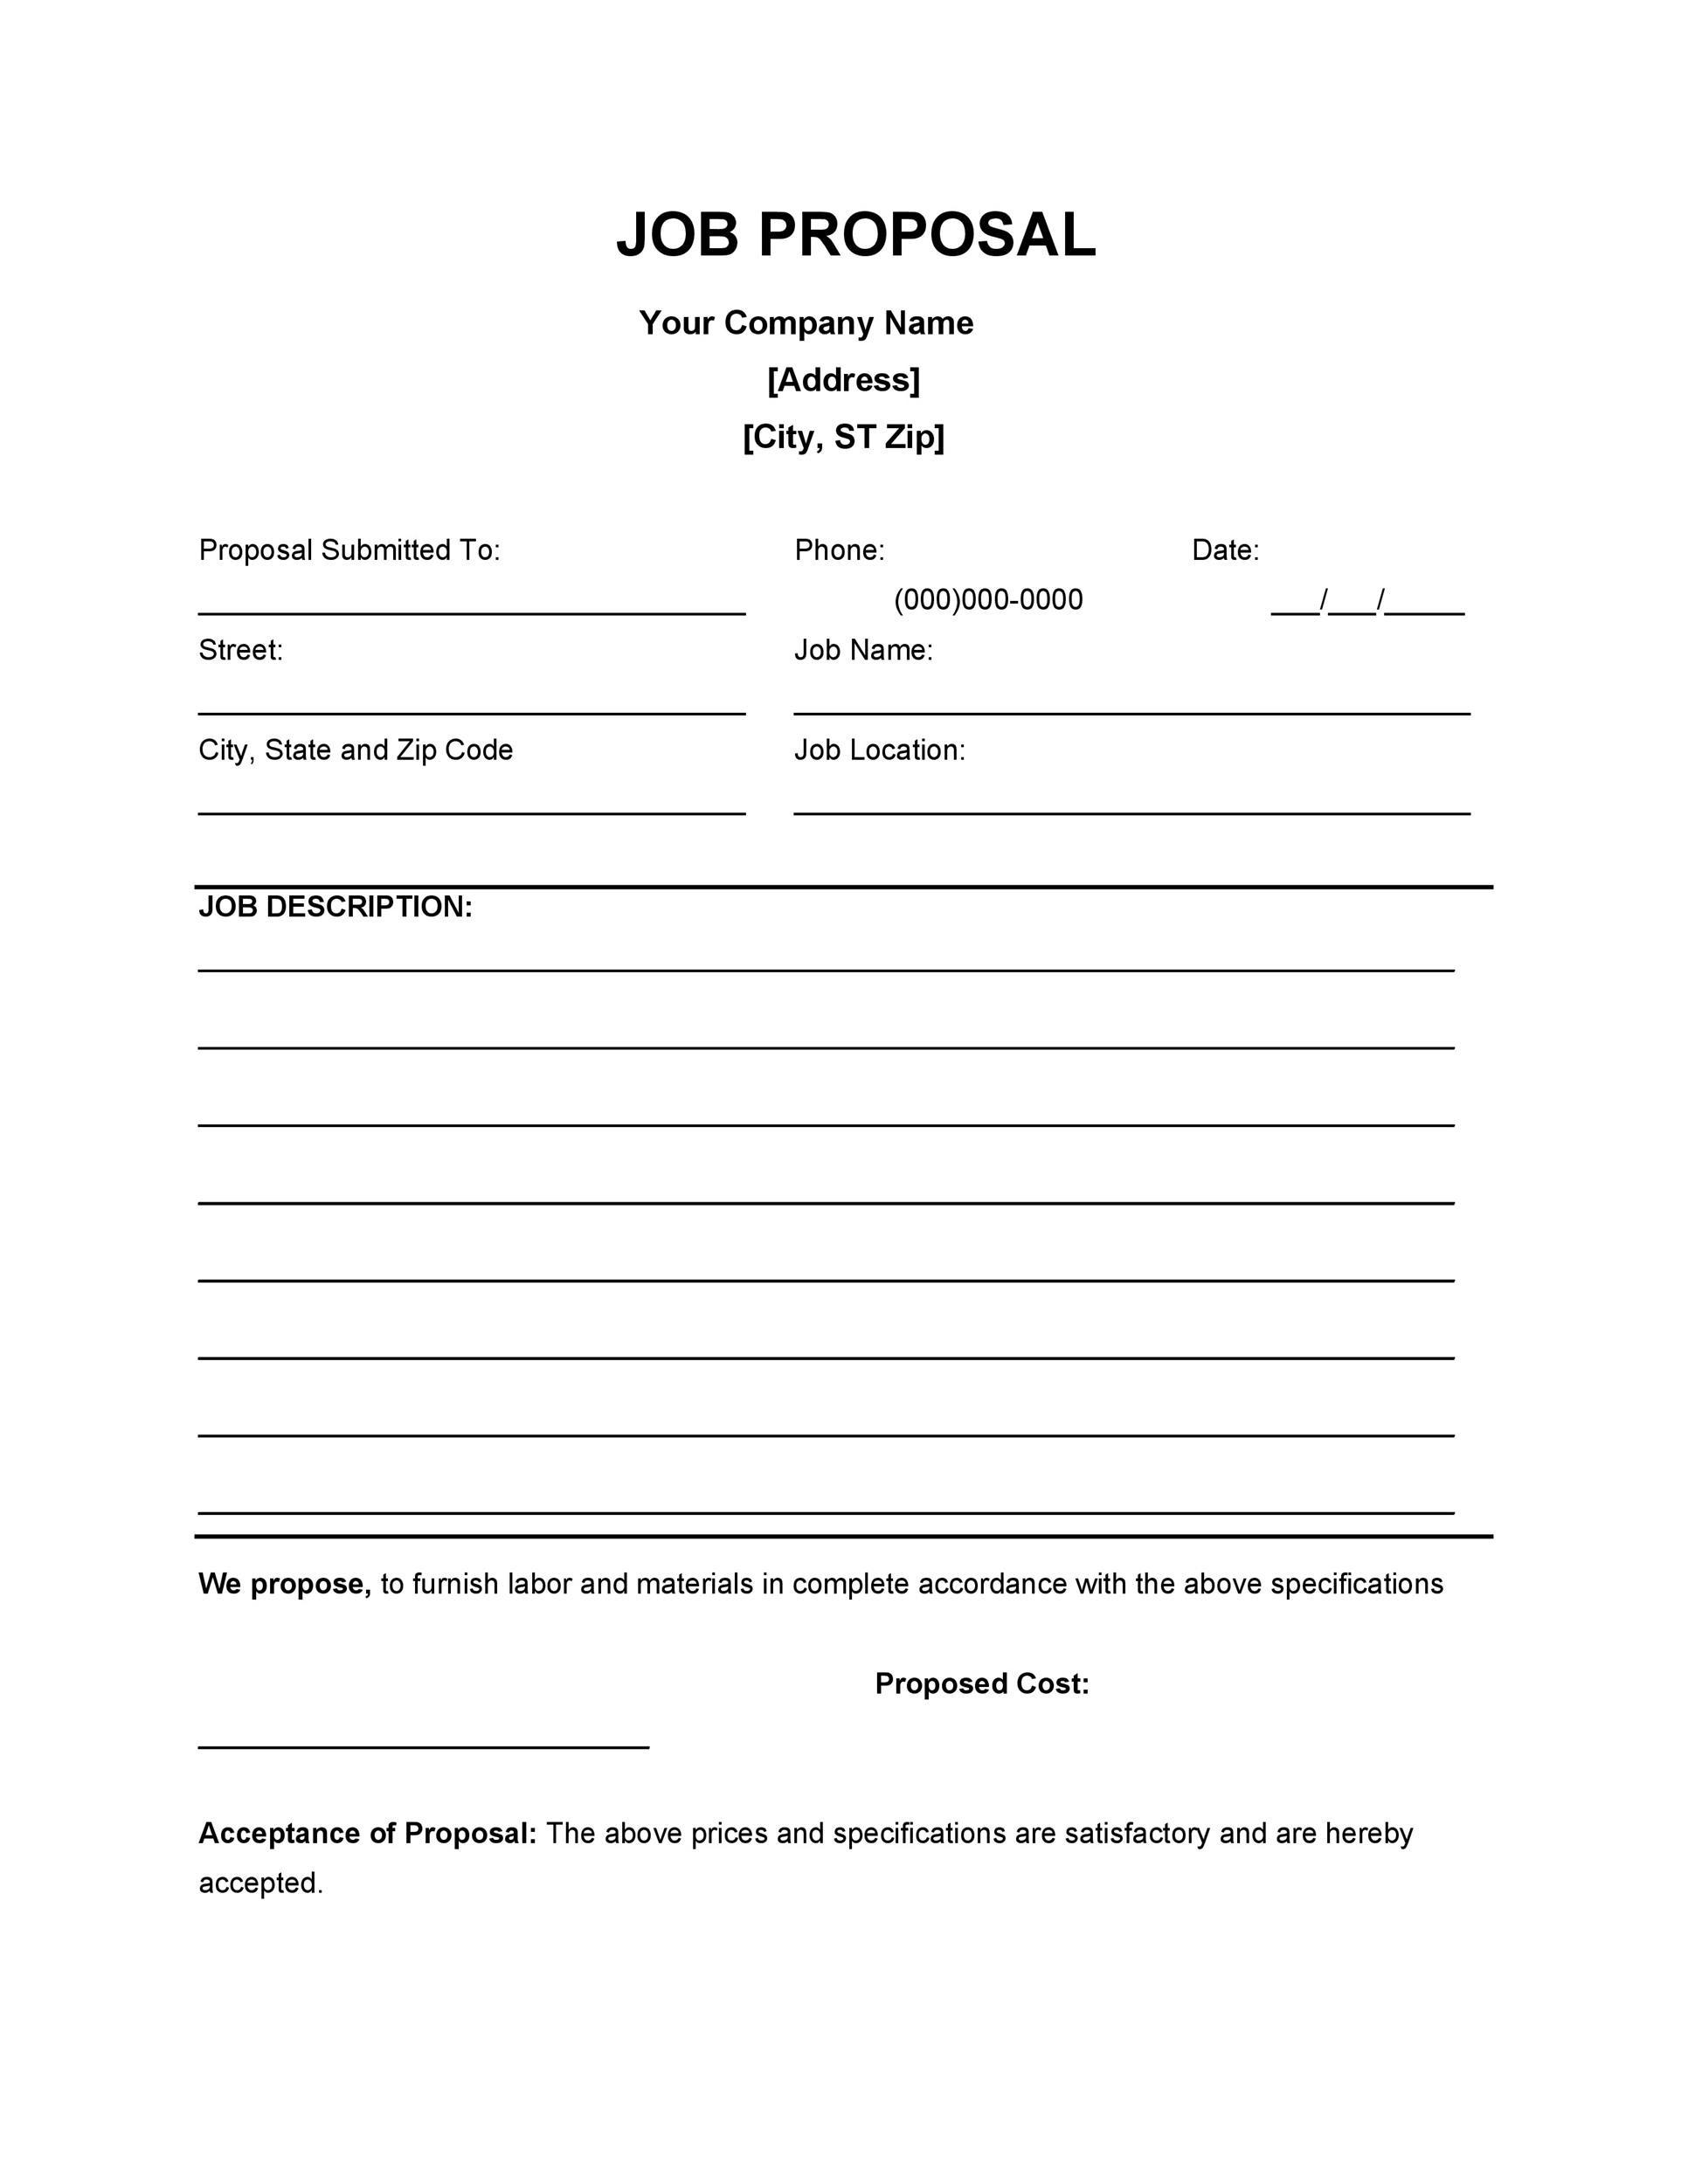 Free Job Proposal Template 02